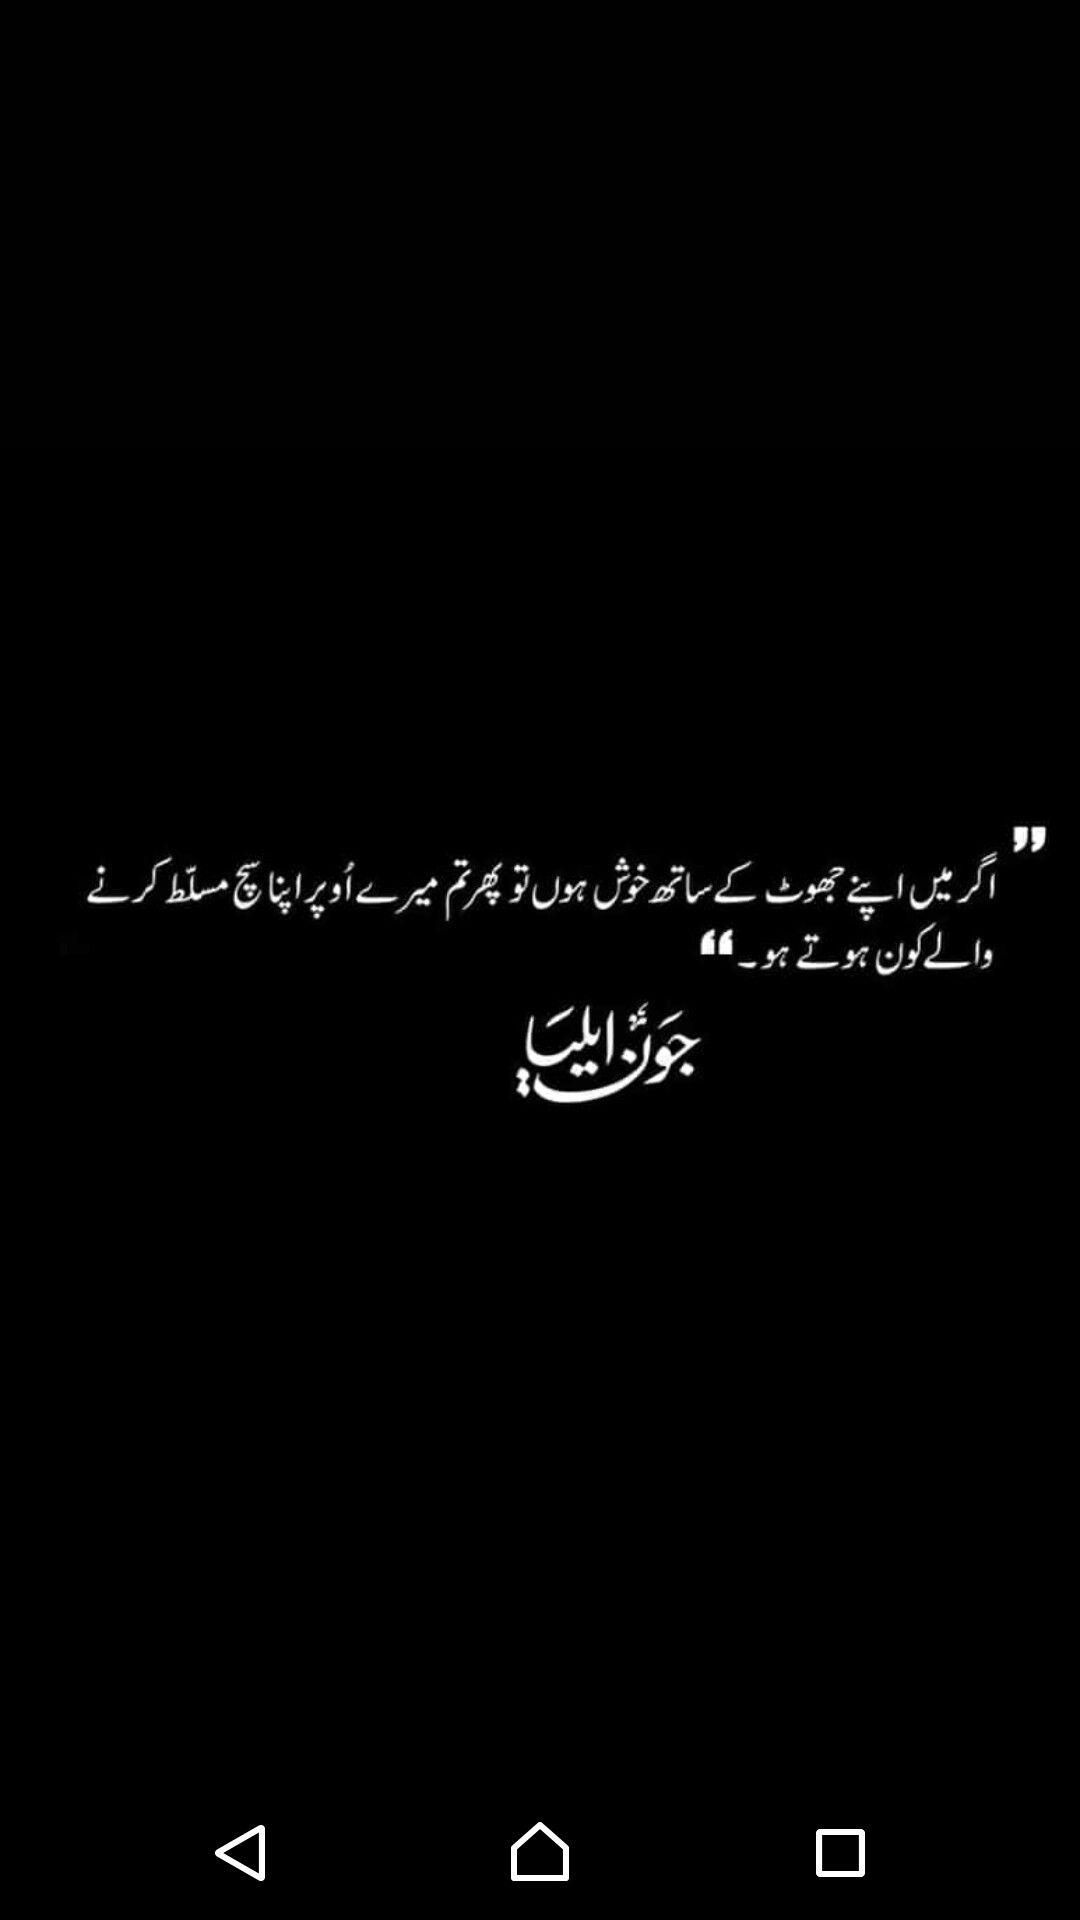 Pin By Sabahat On Urdu Poetry